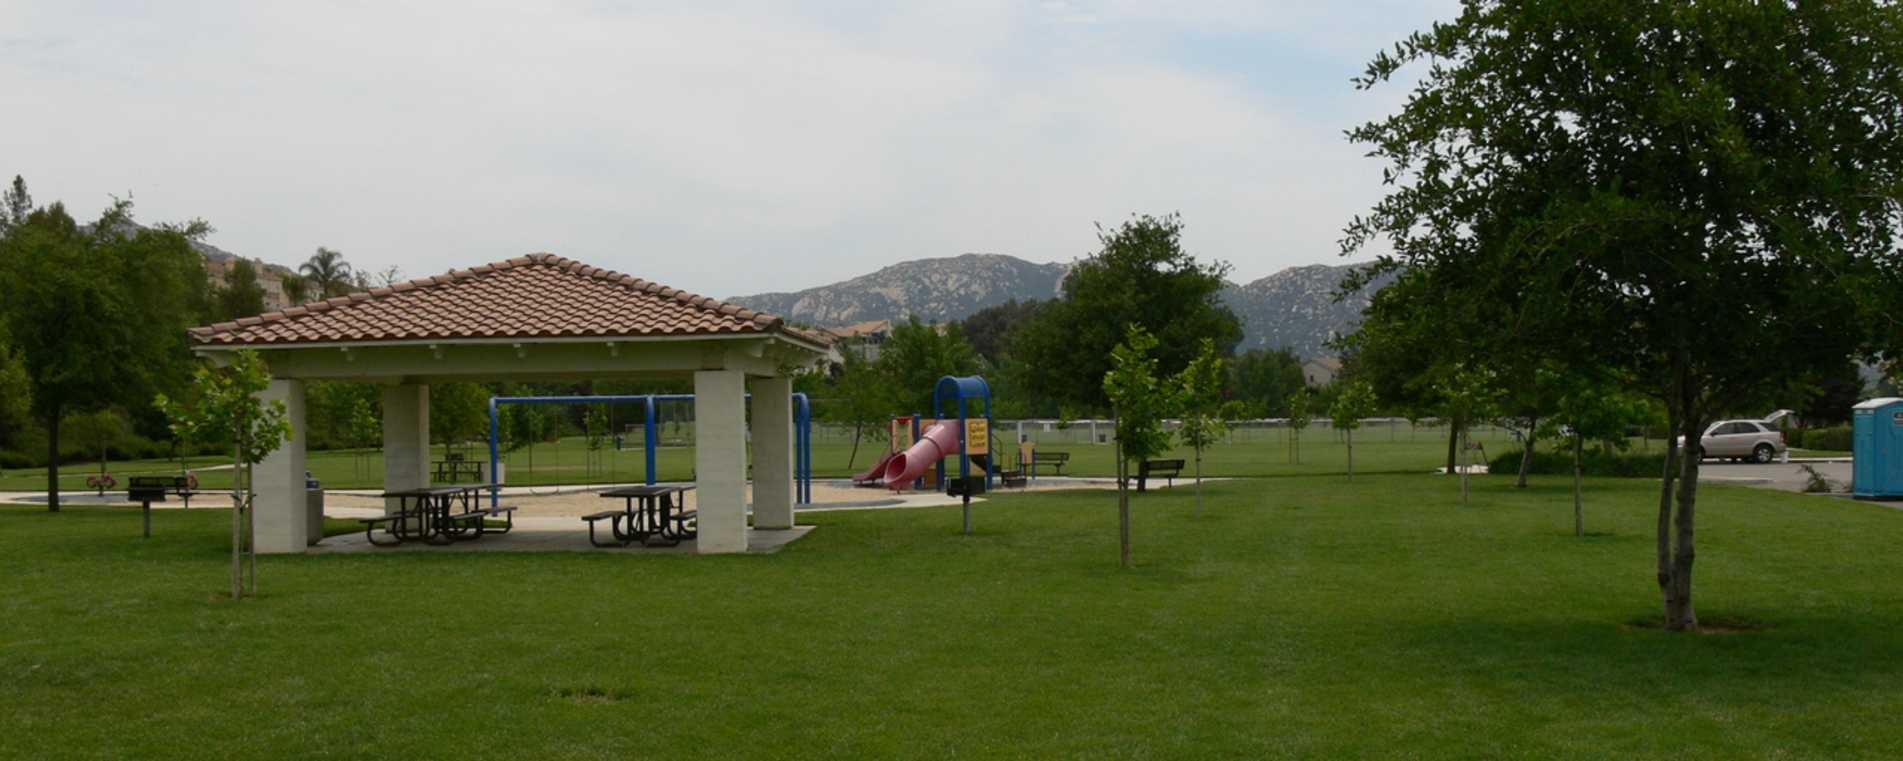 Redhawk Community Park